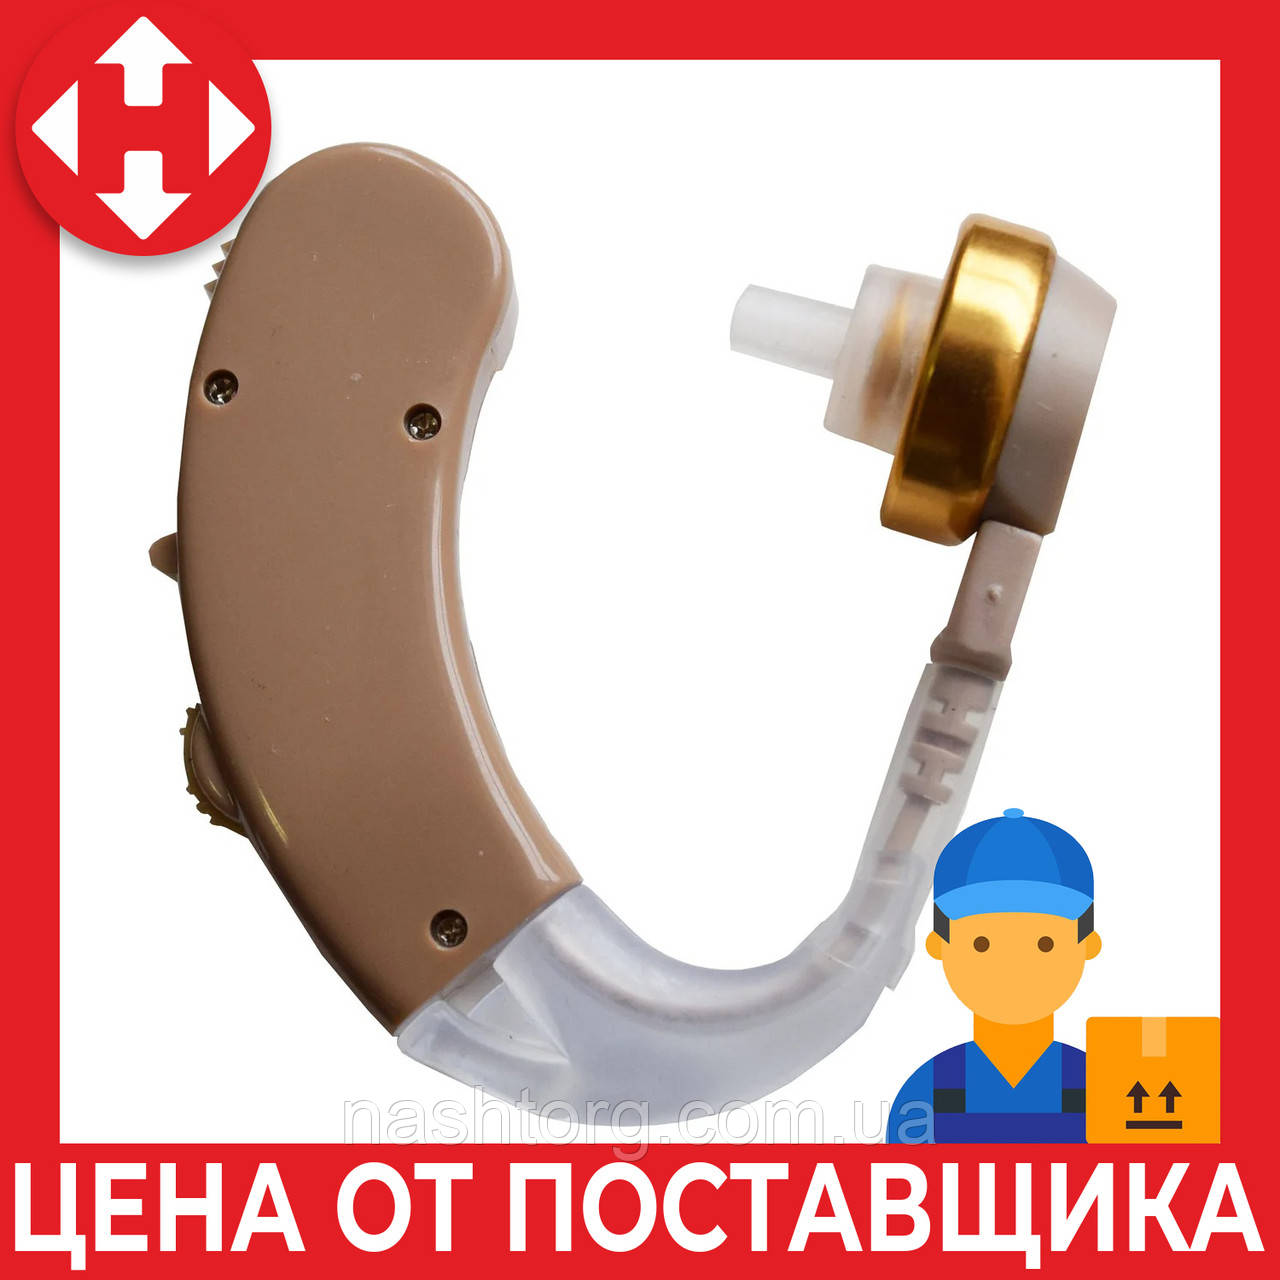 Слуховой апарат, Аксон, axon f 139, усилитель слуха, Axon